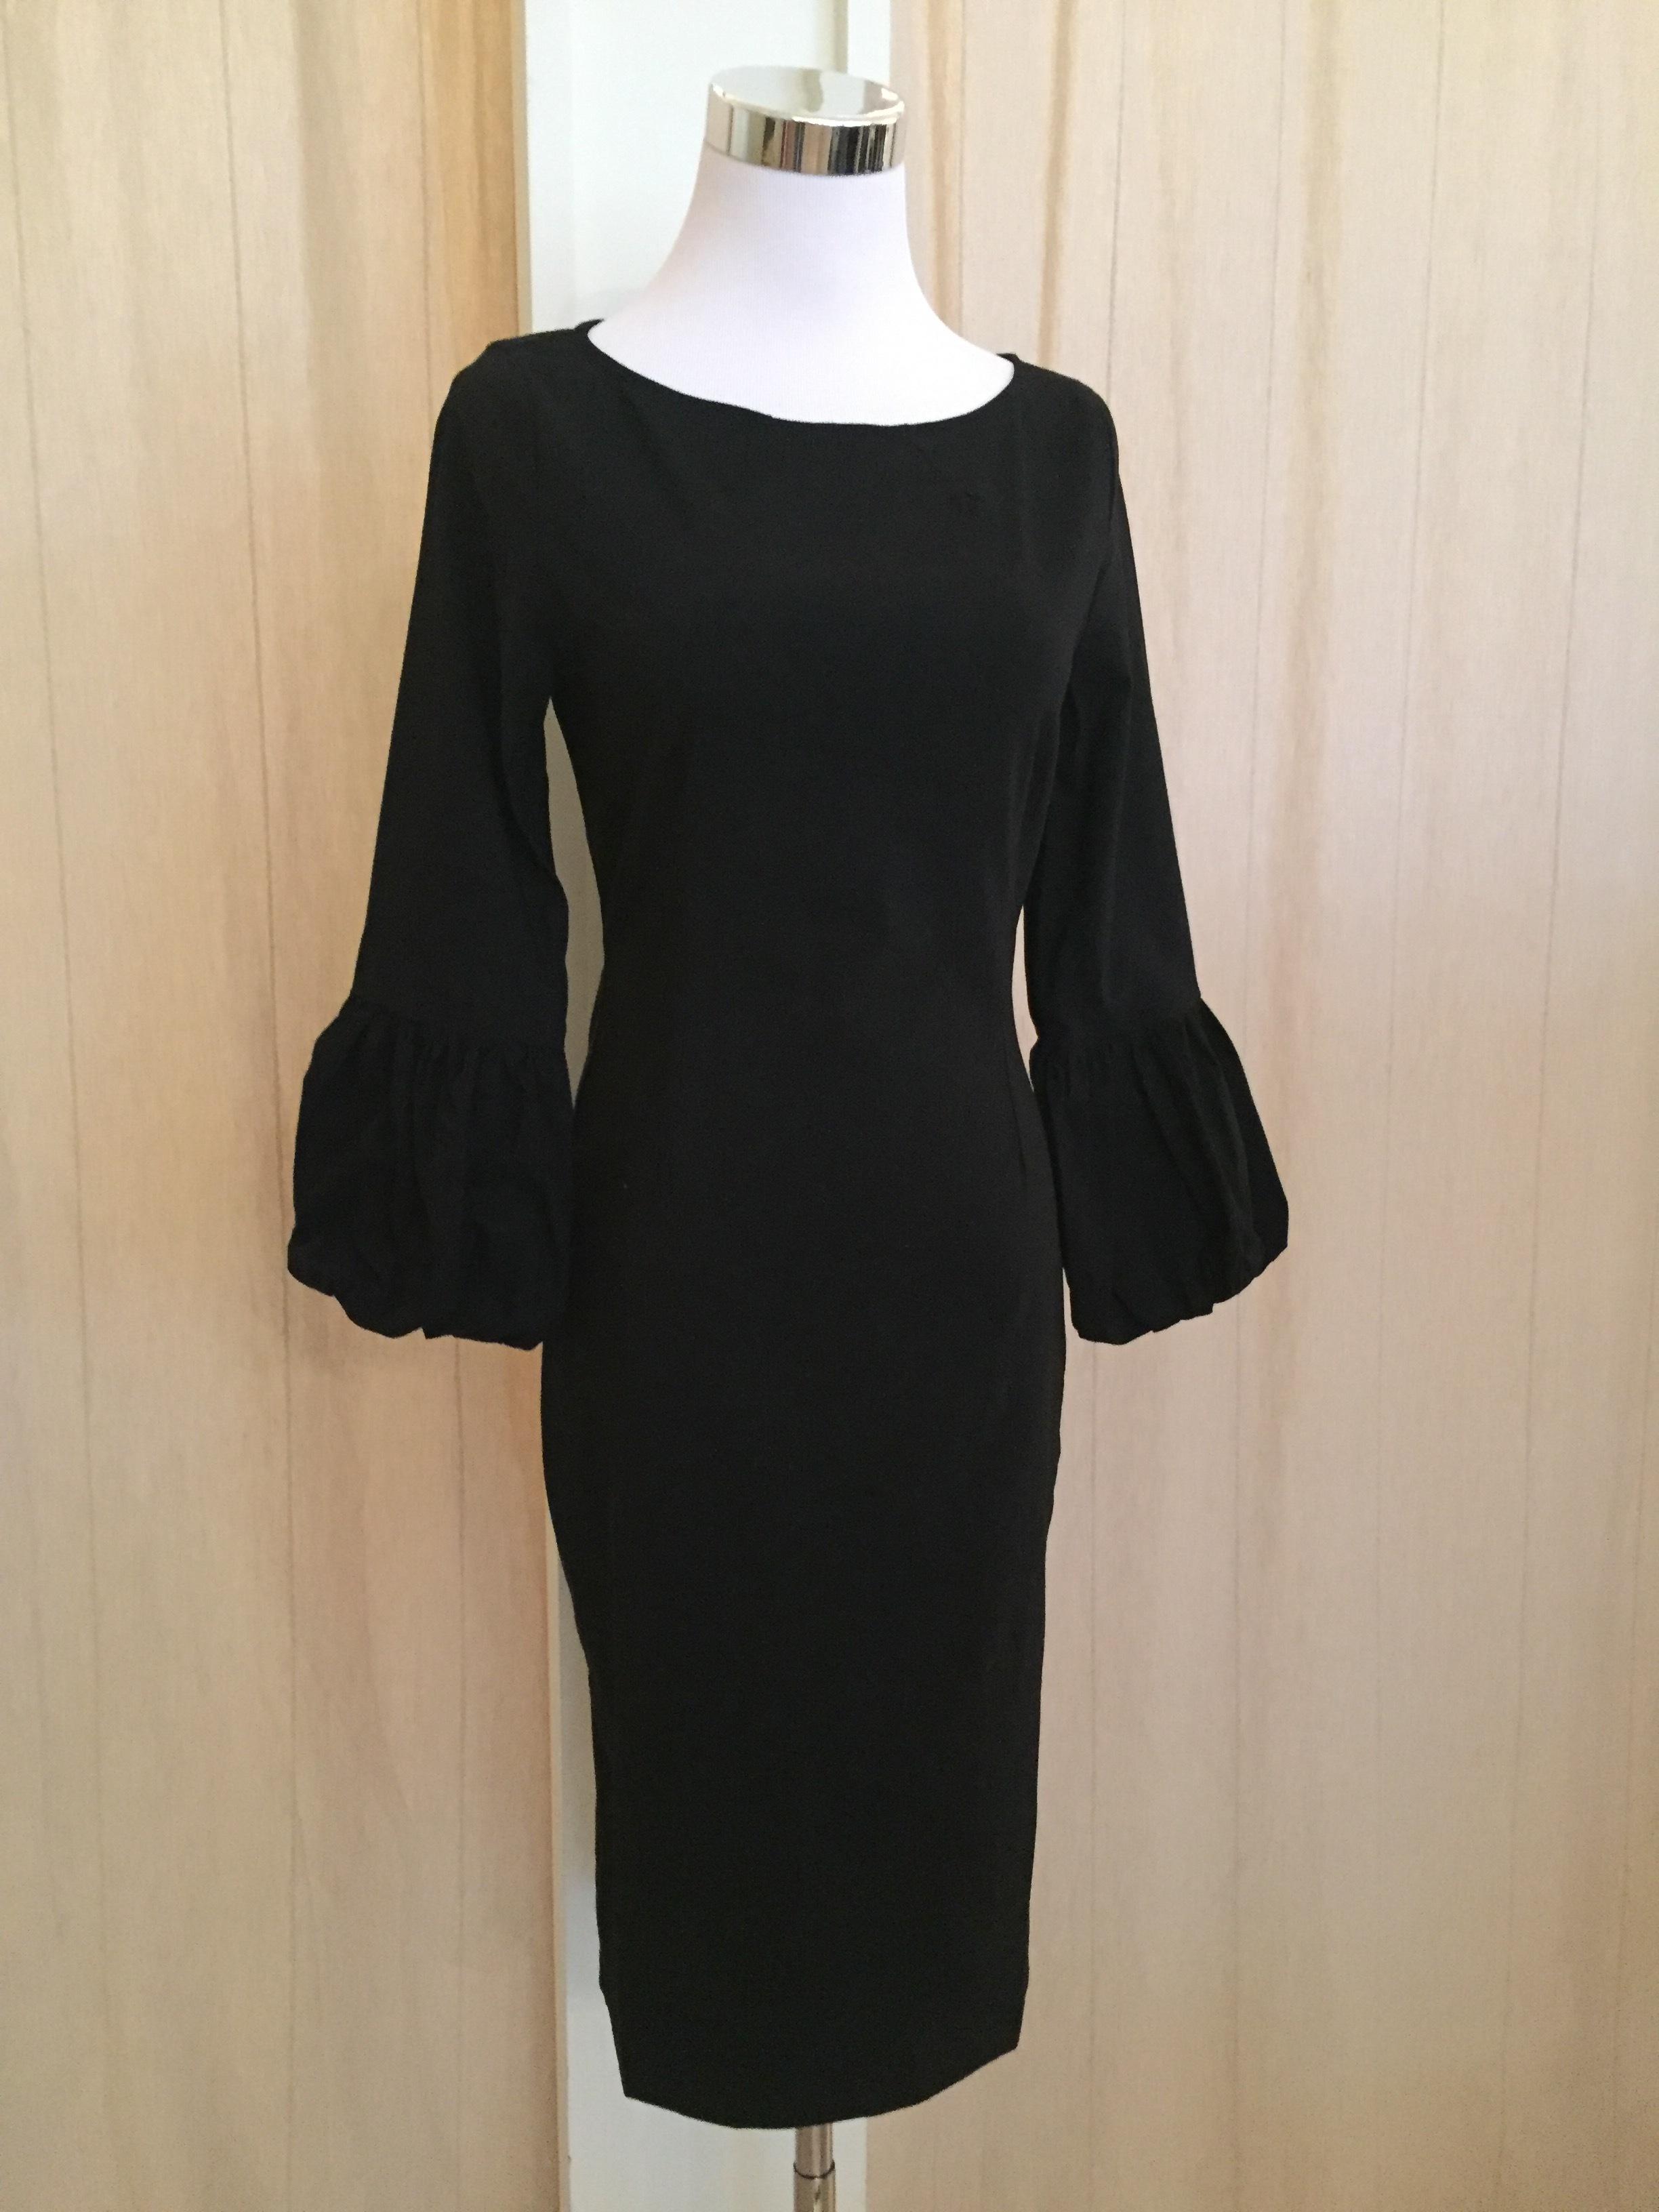 Poof sleeve dress $58